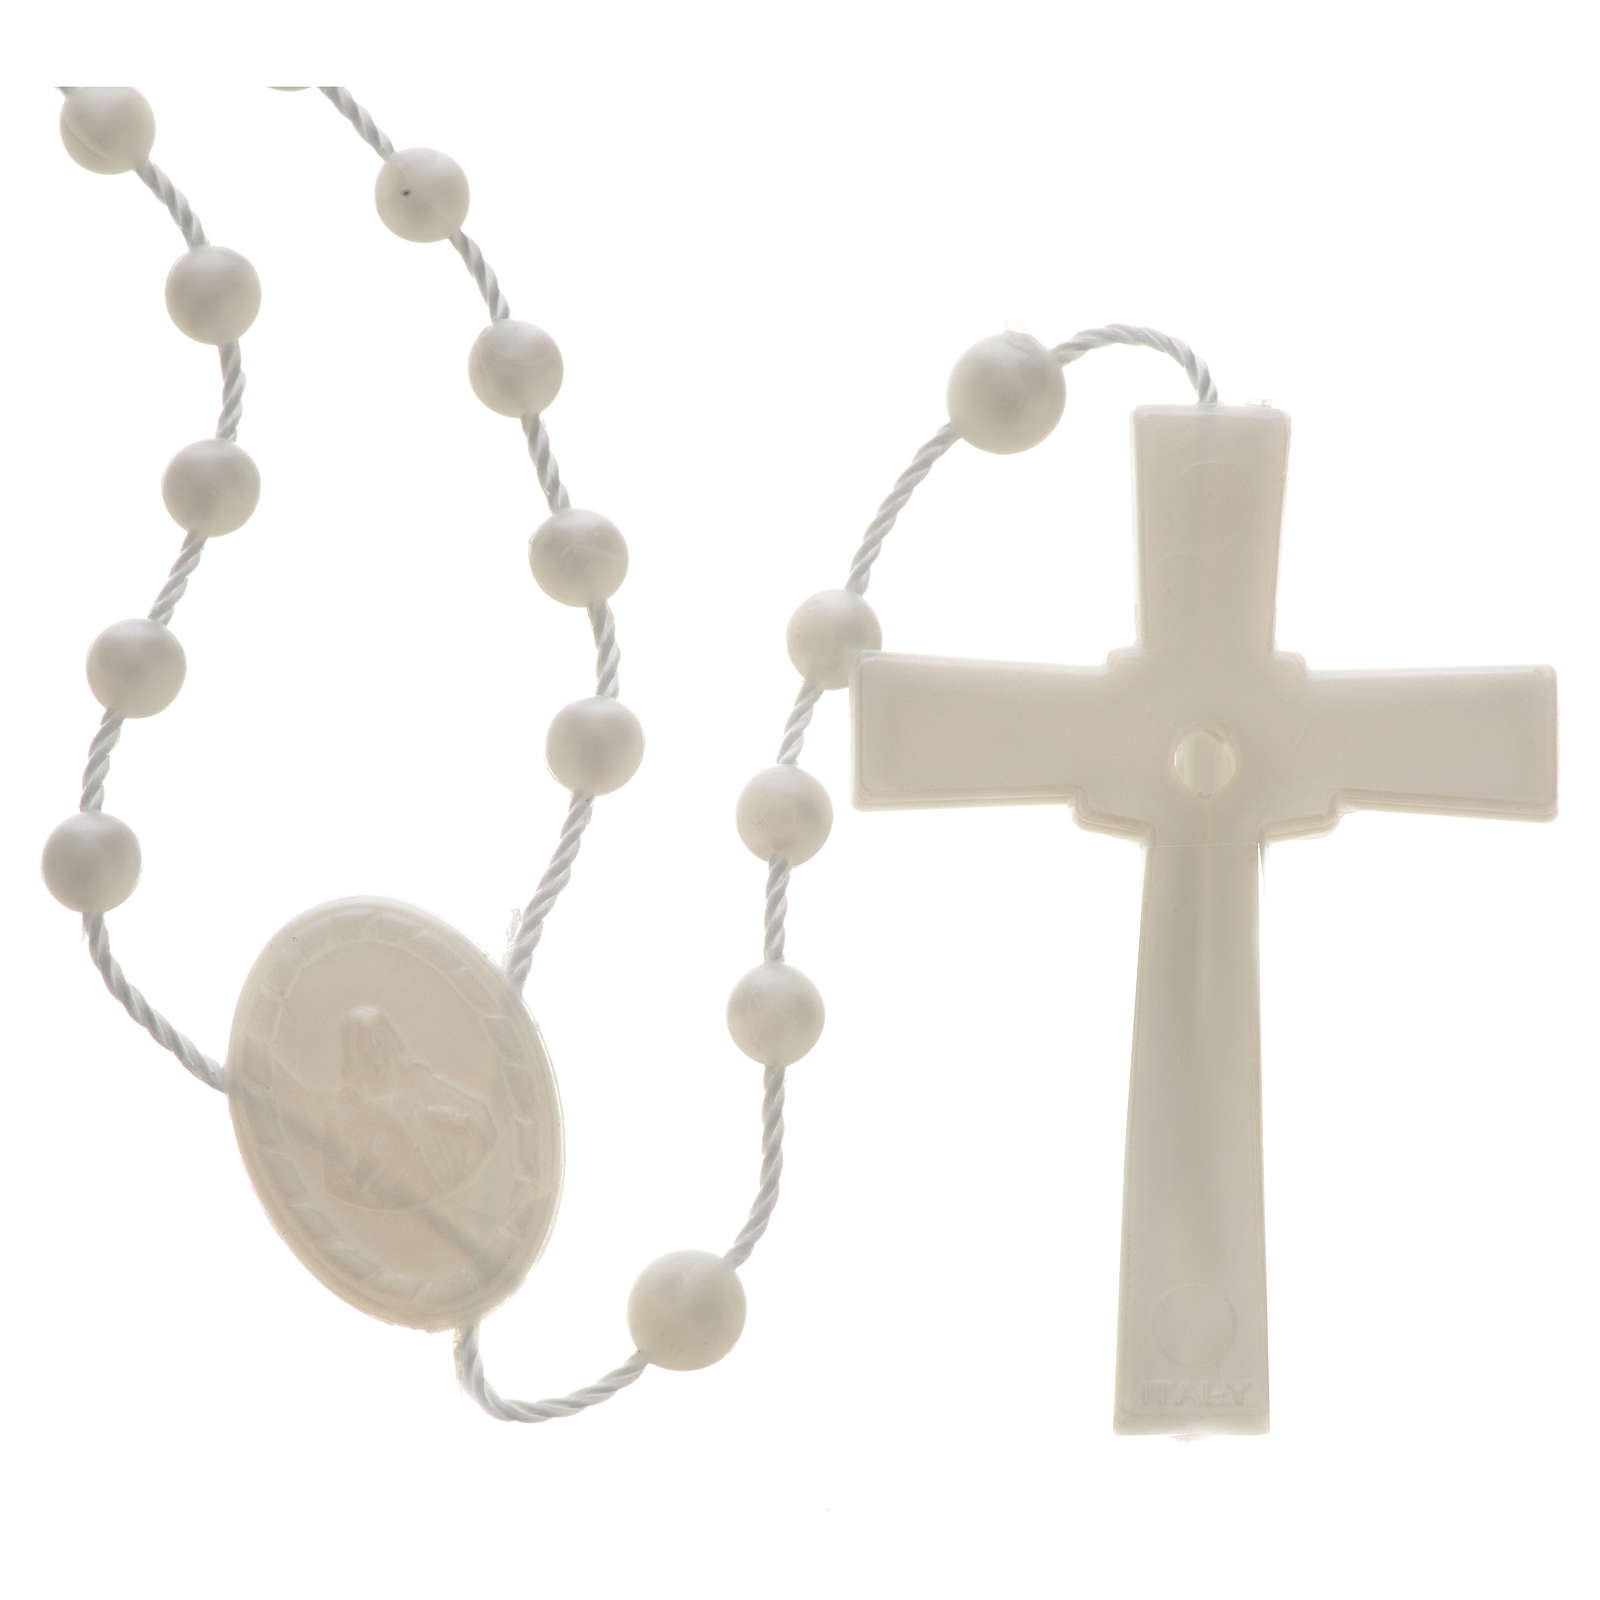 Chapelet en nylon blanc perlé 4